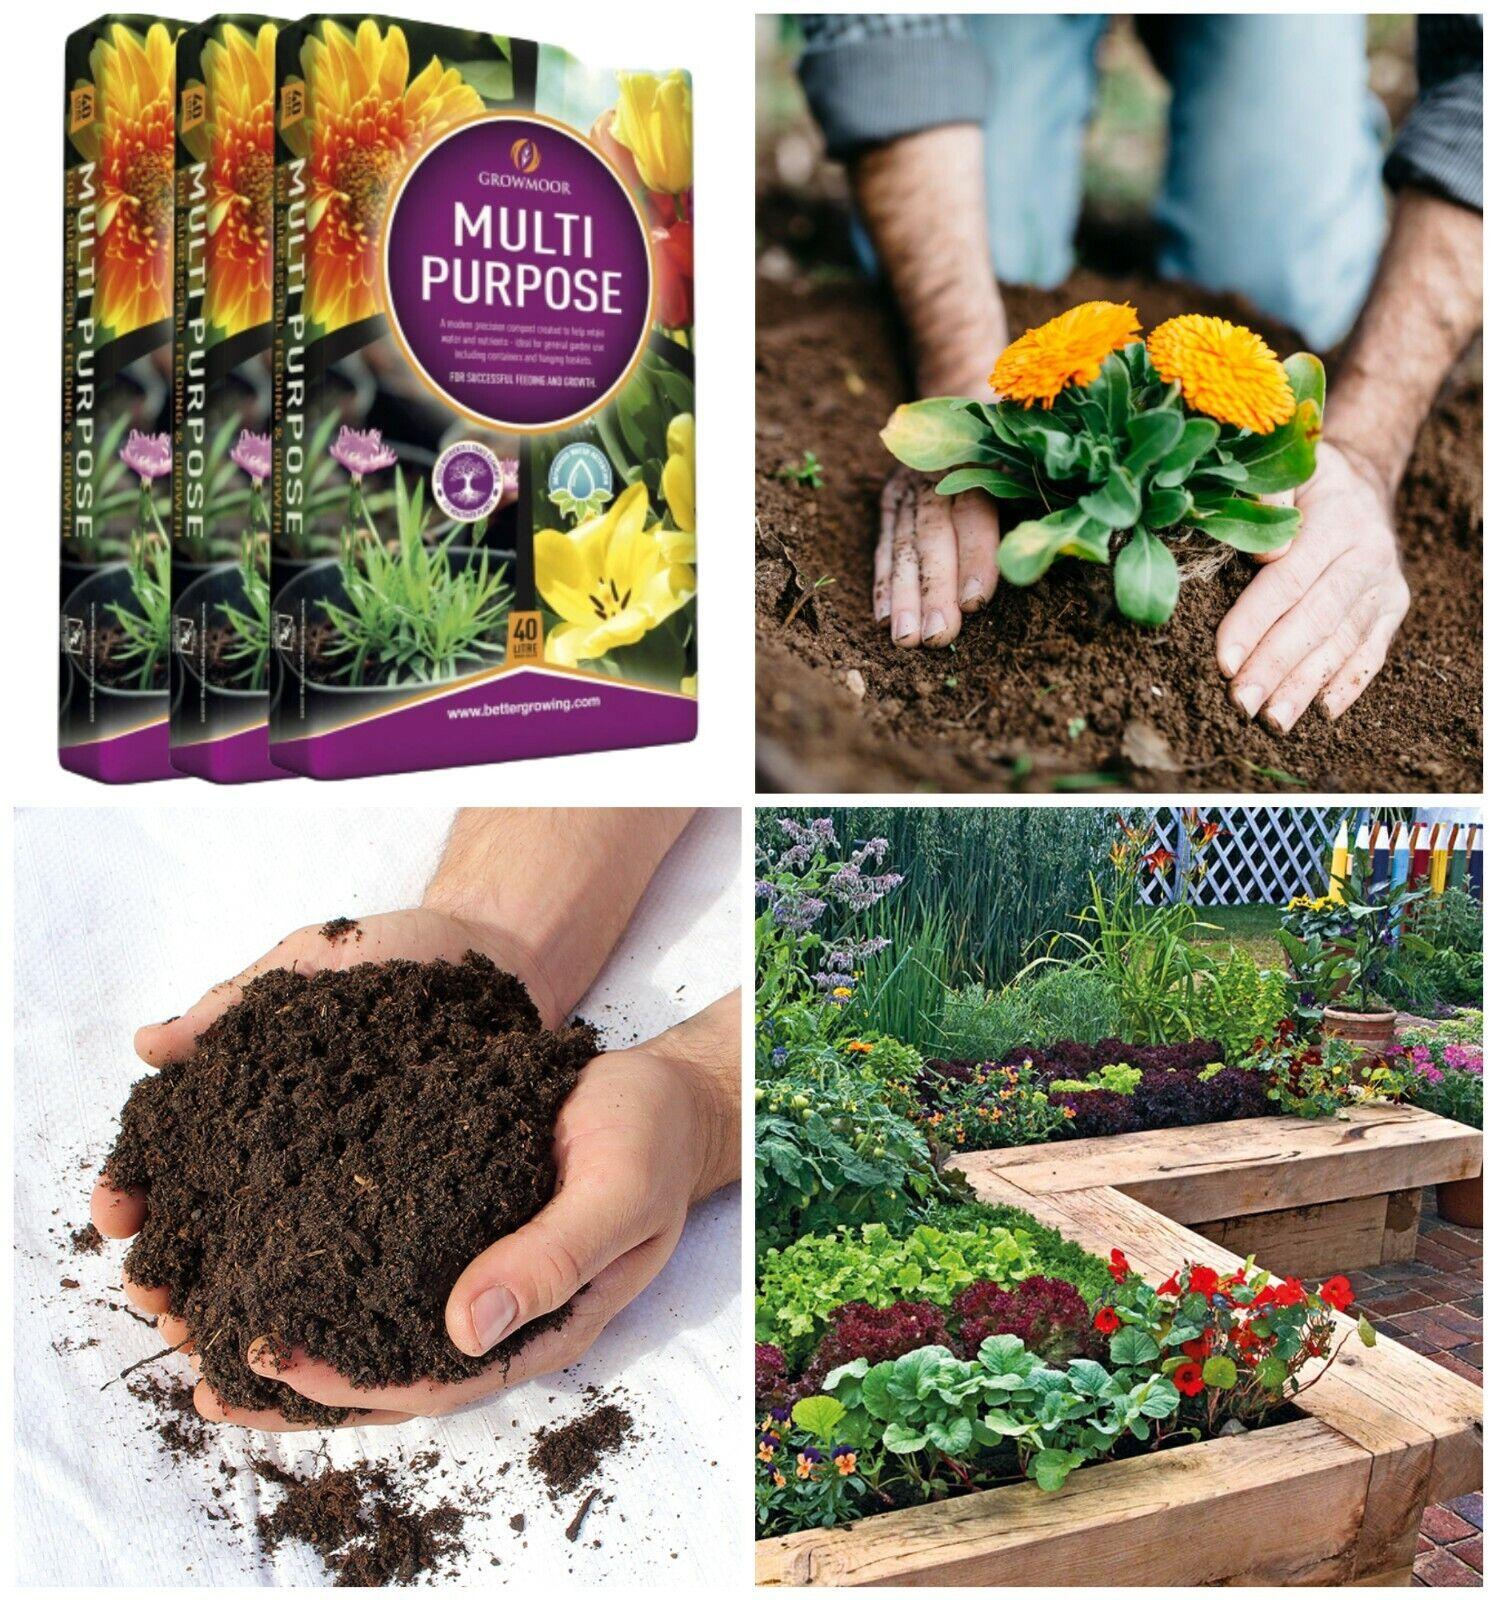 3x 40L Growmoor Plant Care Pot Flower Compost Basket Enriched Soil Bed Borders